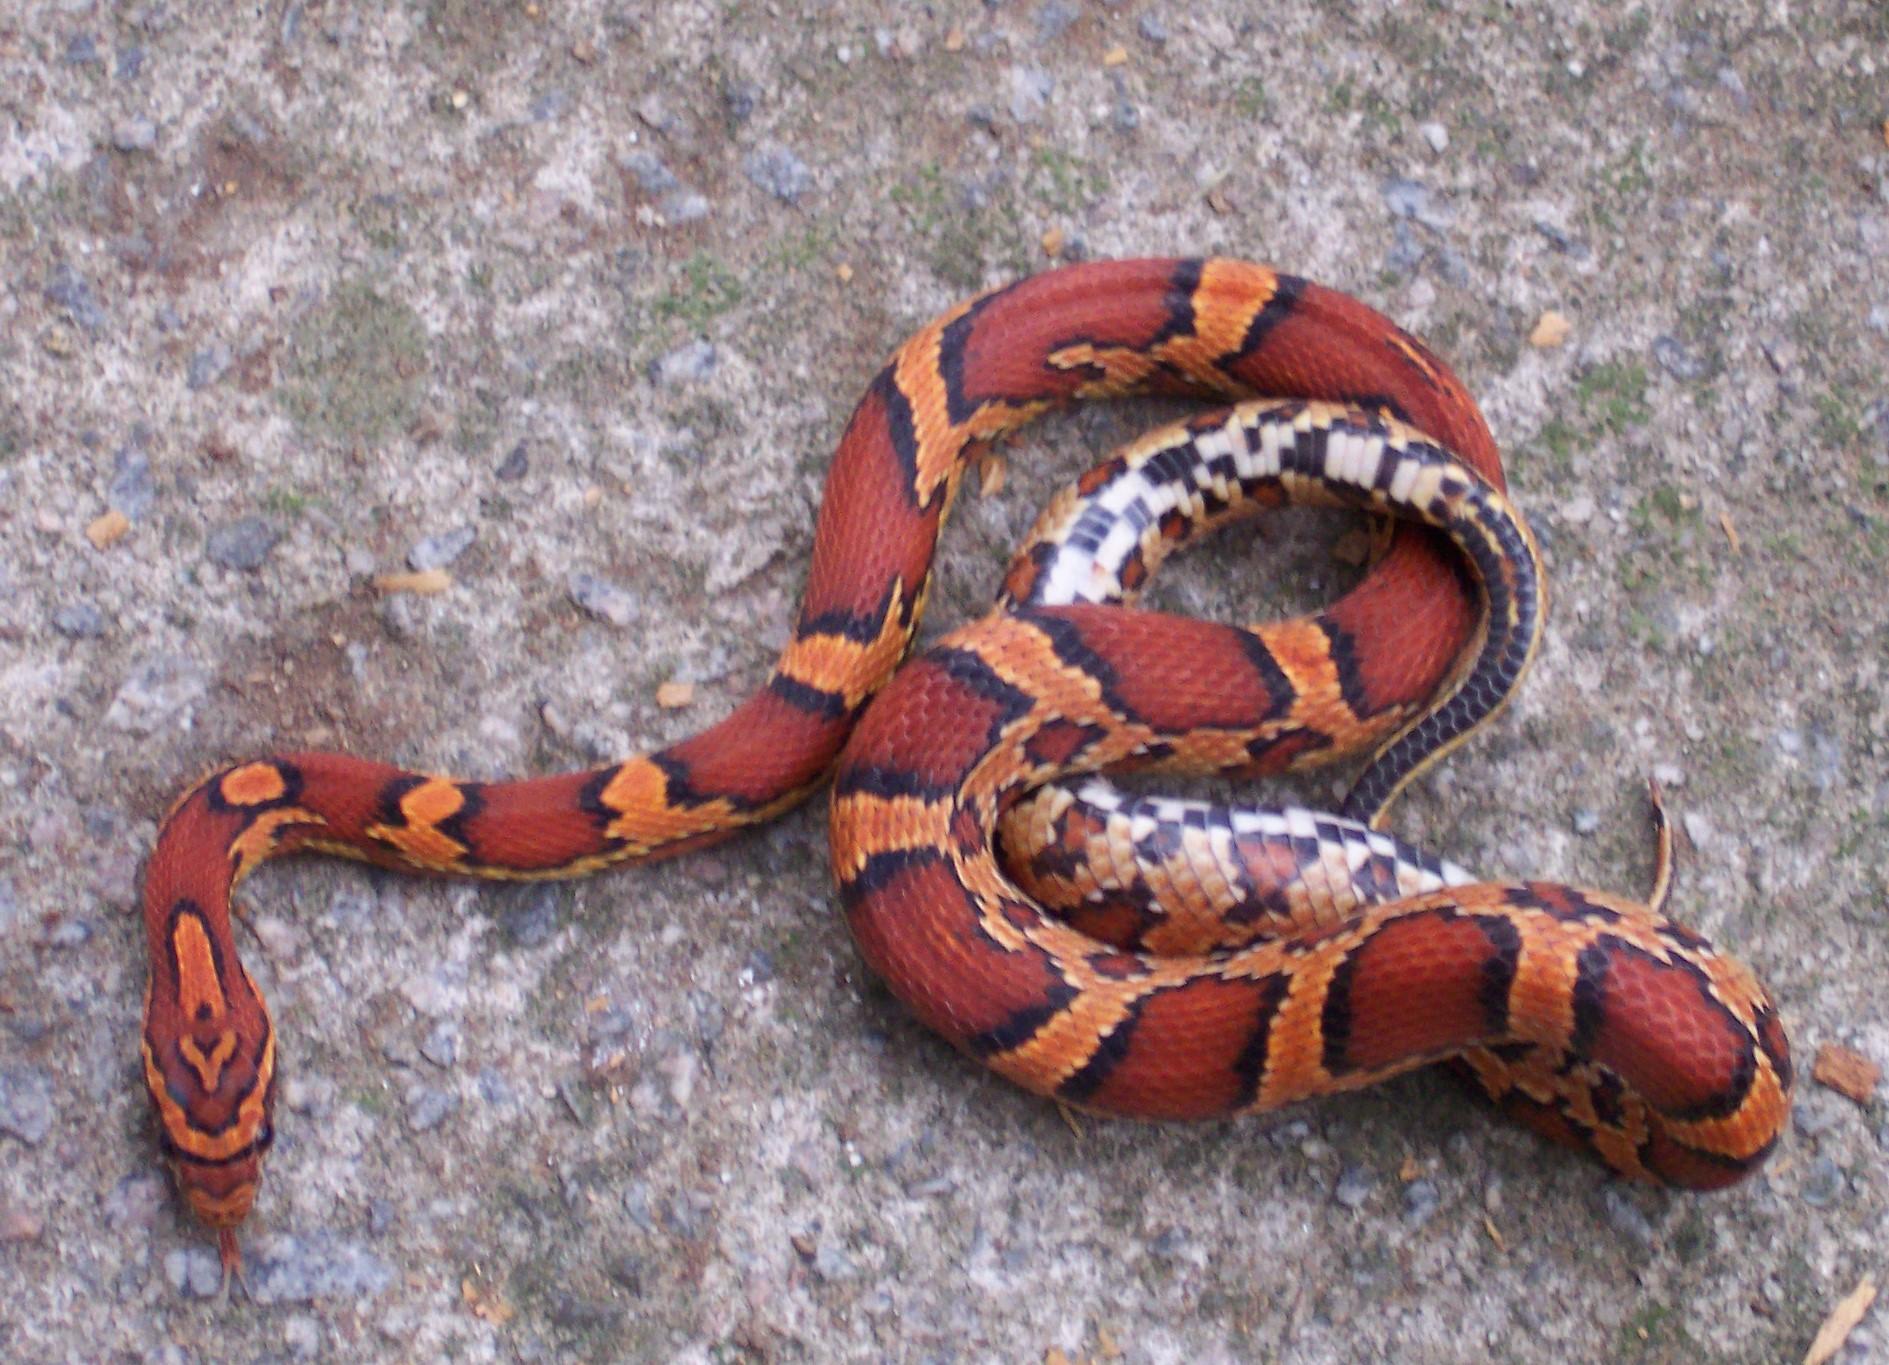 File:Okeetee corn snake.jpg